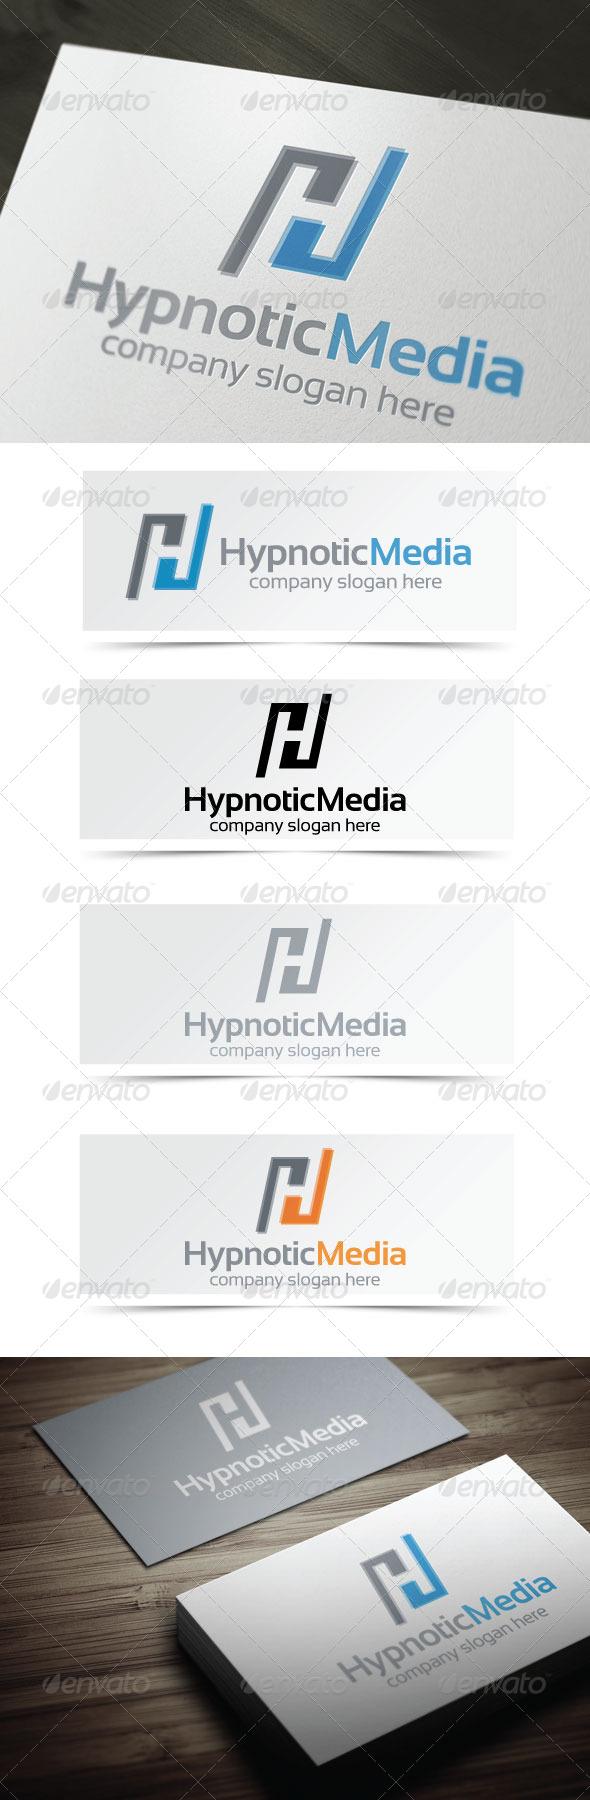 Hypnotic Media - Letters Logo Templates